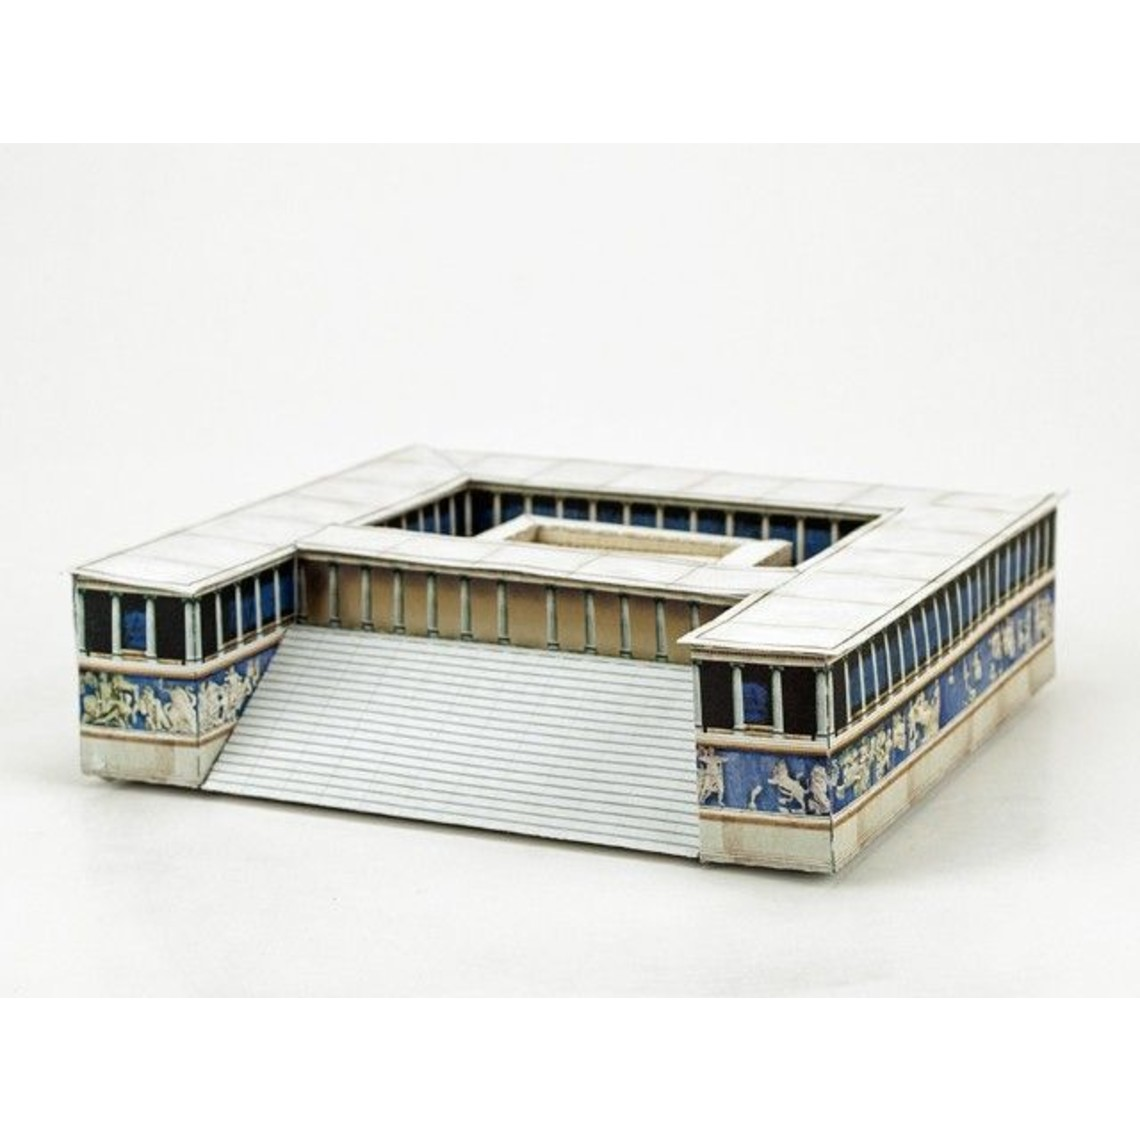 Modellbau Bausatz Pergamon